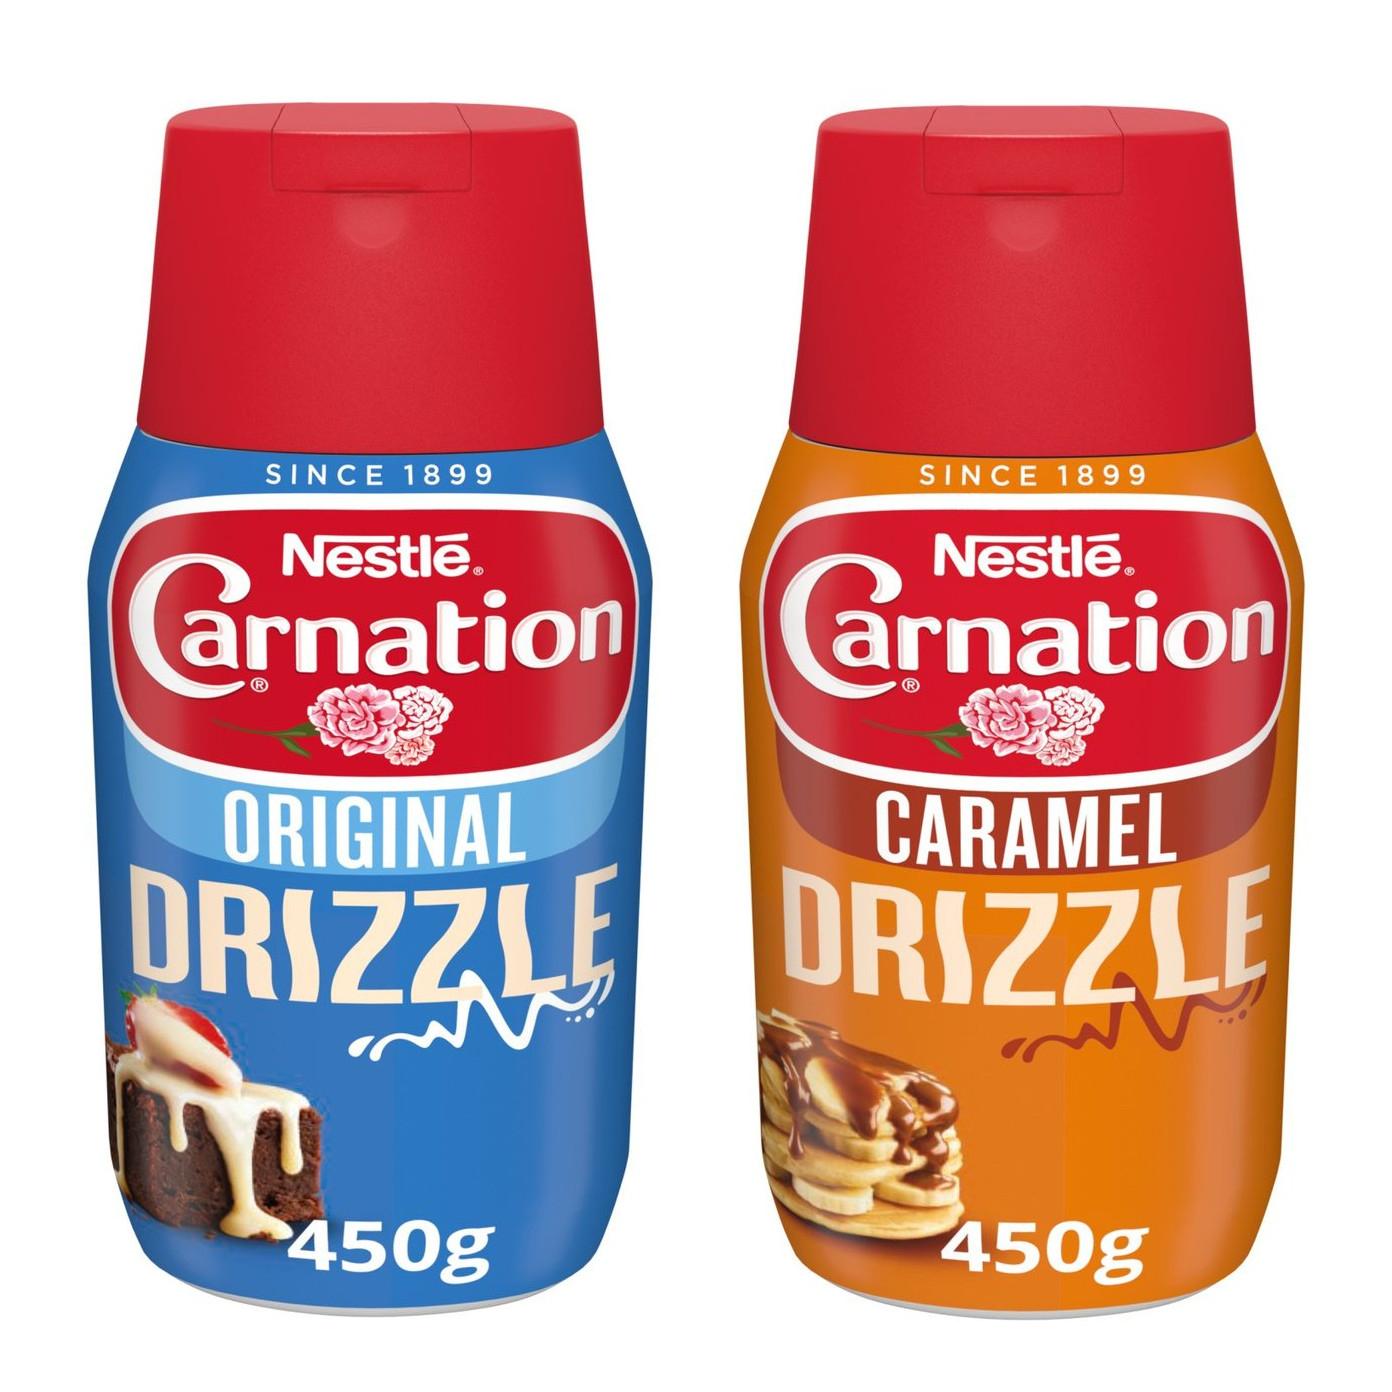 Carnation Drizzle Original Condensed Milk 450g or Caramel 450g - £1.50 @ Morrisons